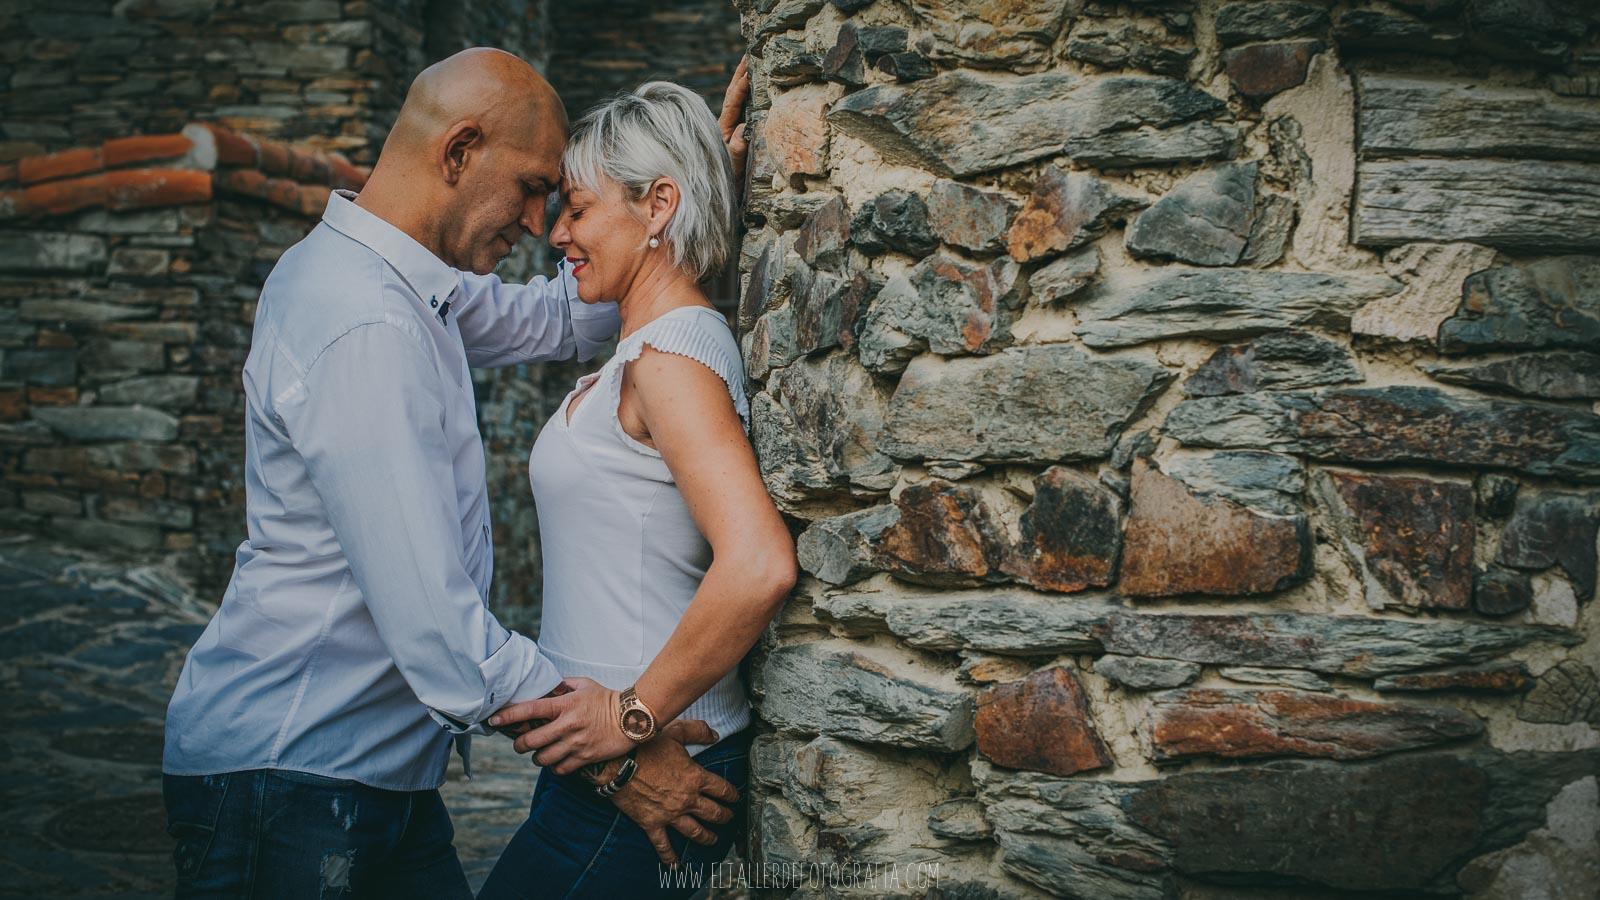 Reportaje de pareja en Patones de Arriba